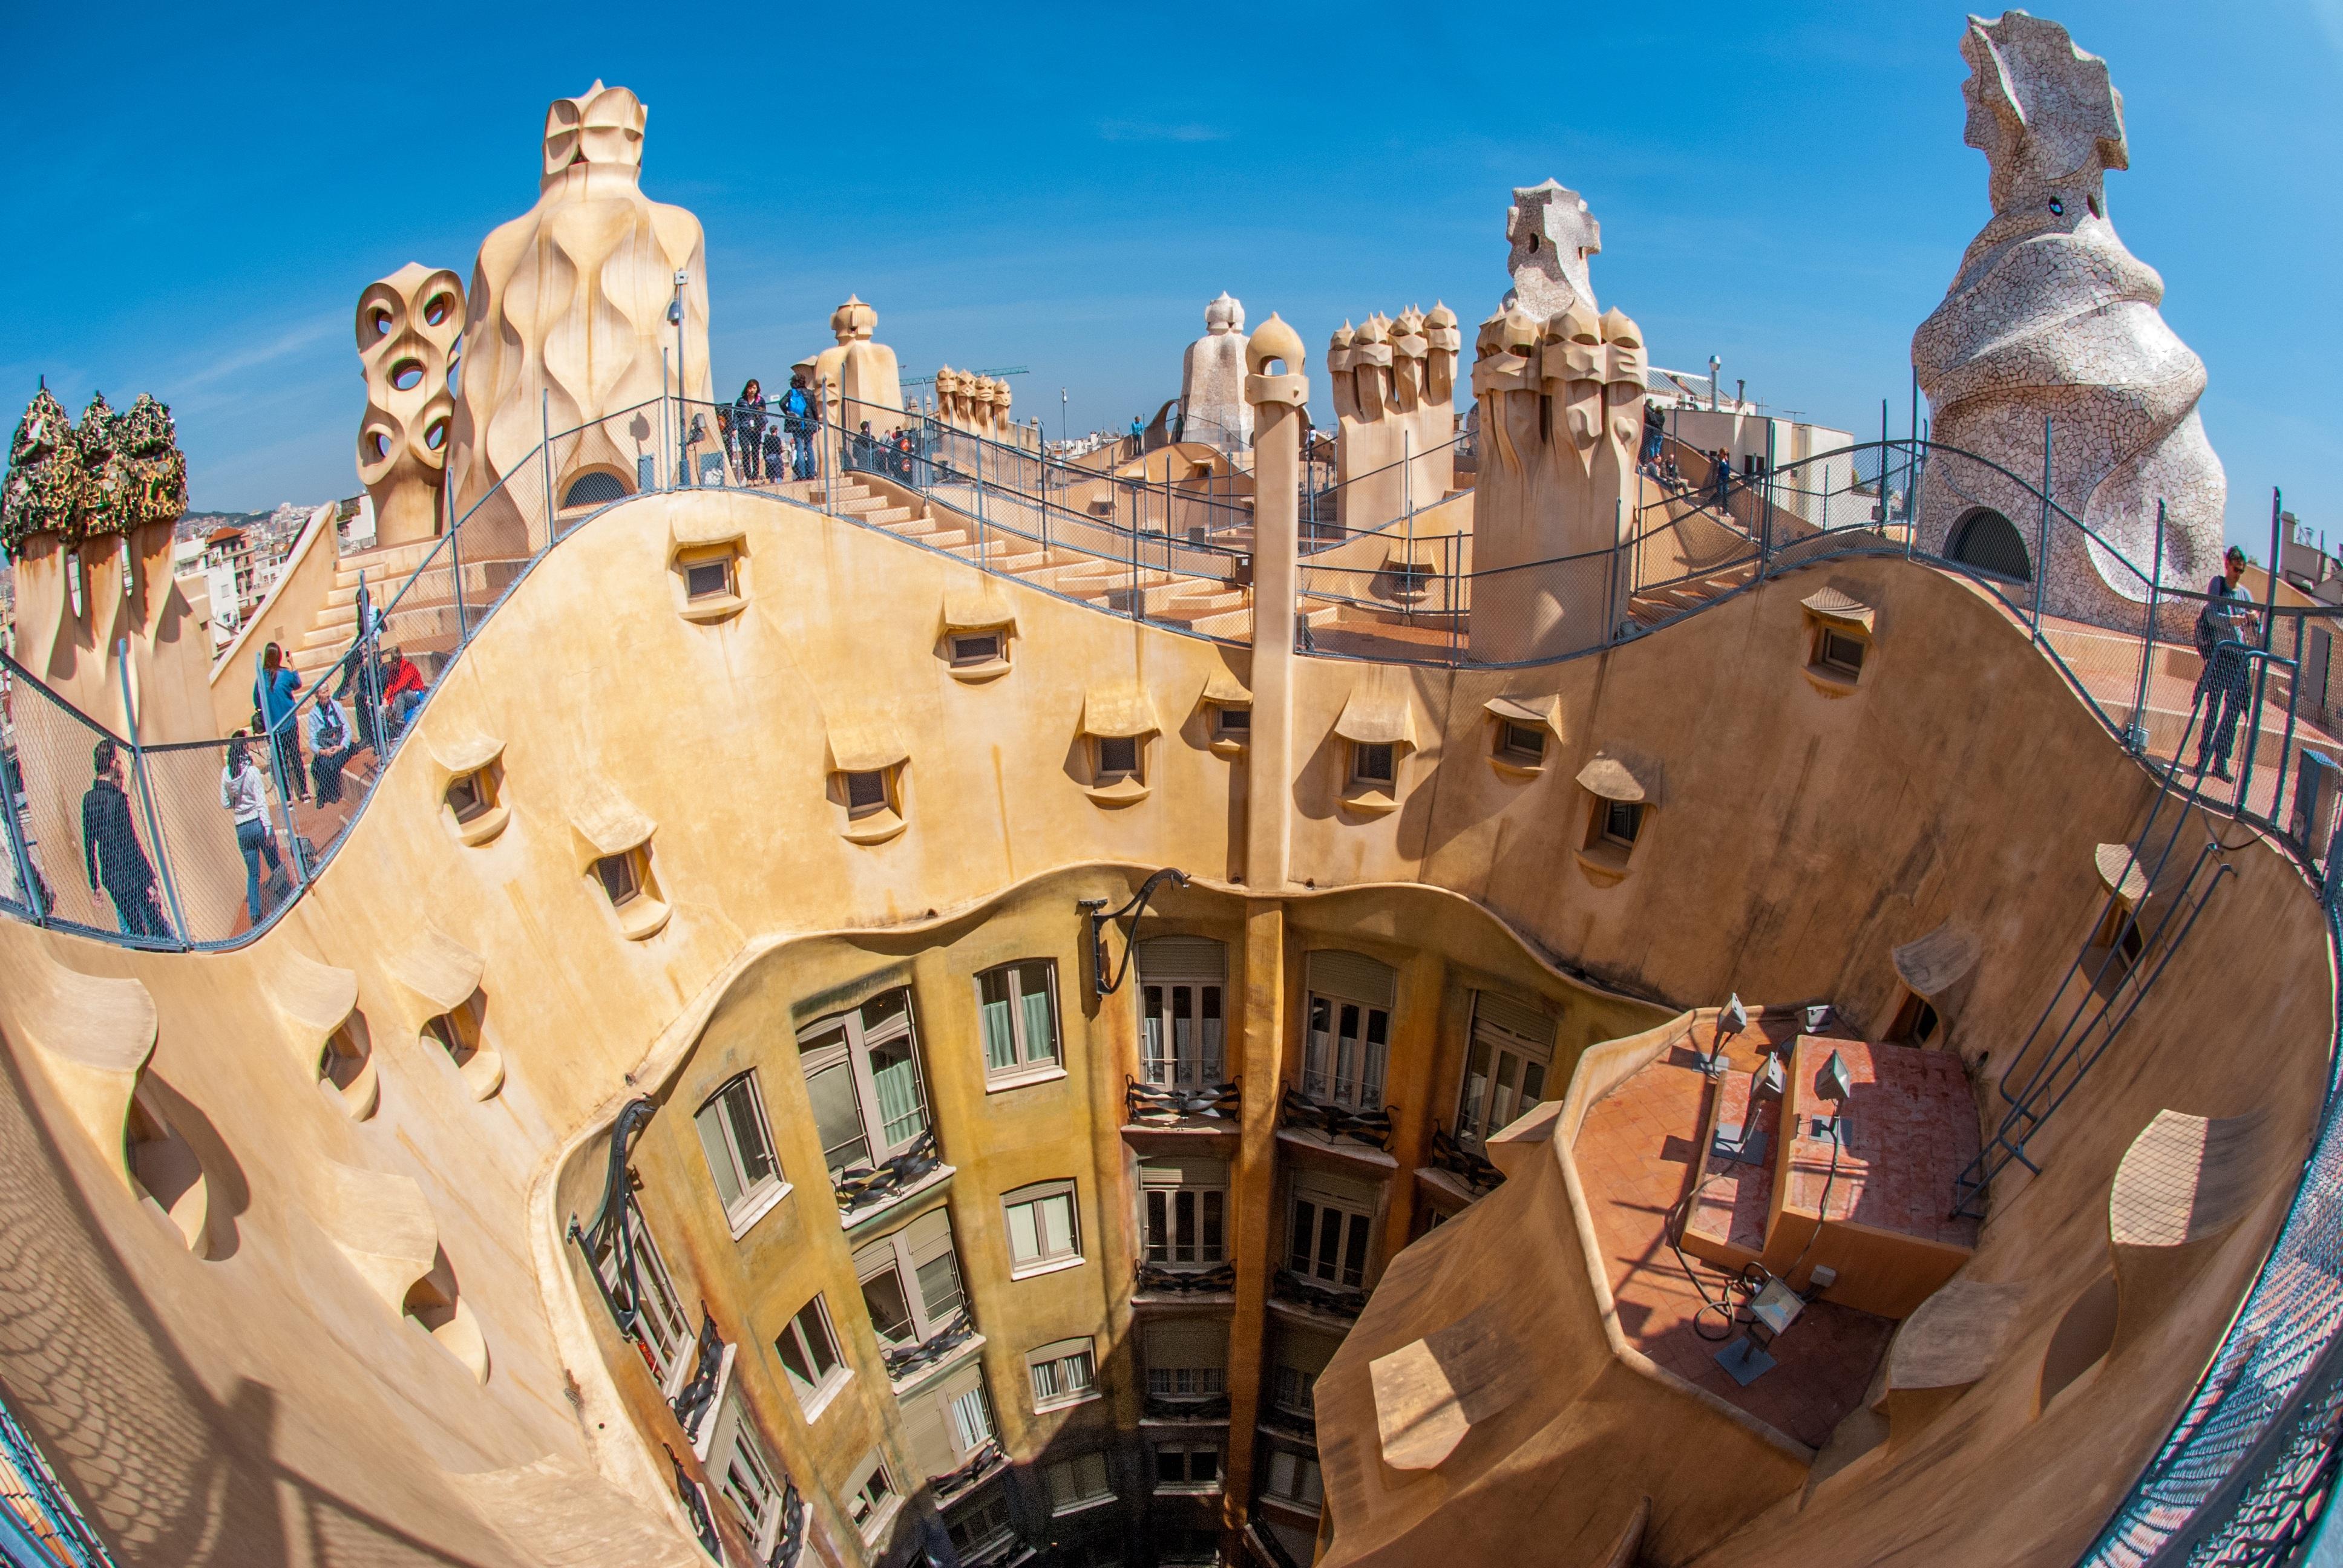 Free Images Landscape Architecture Sky House Roof Building